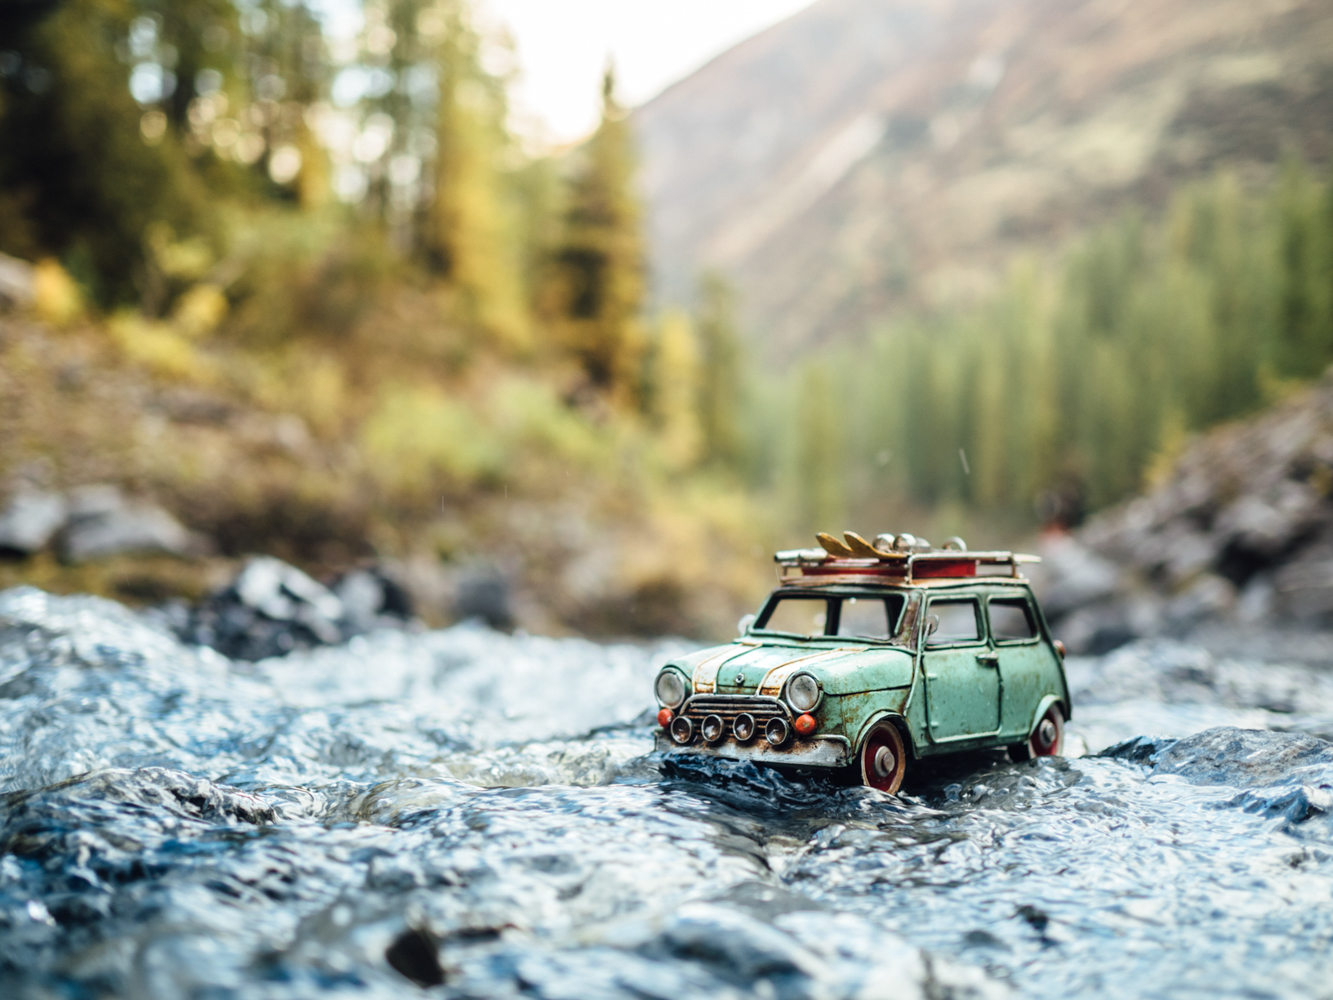 Instagrammer Kim Leuenberger On Her Travelling Cars